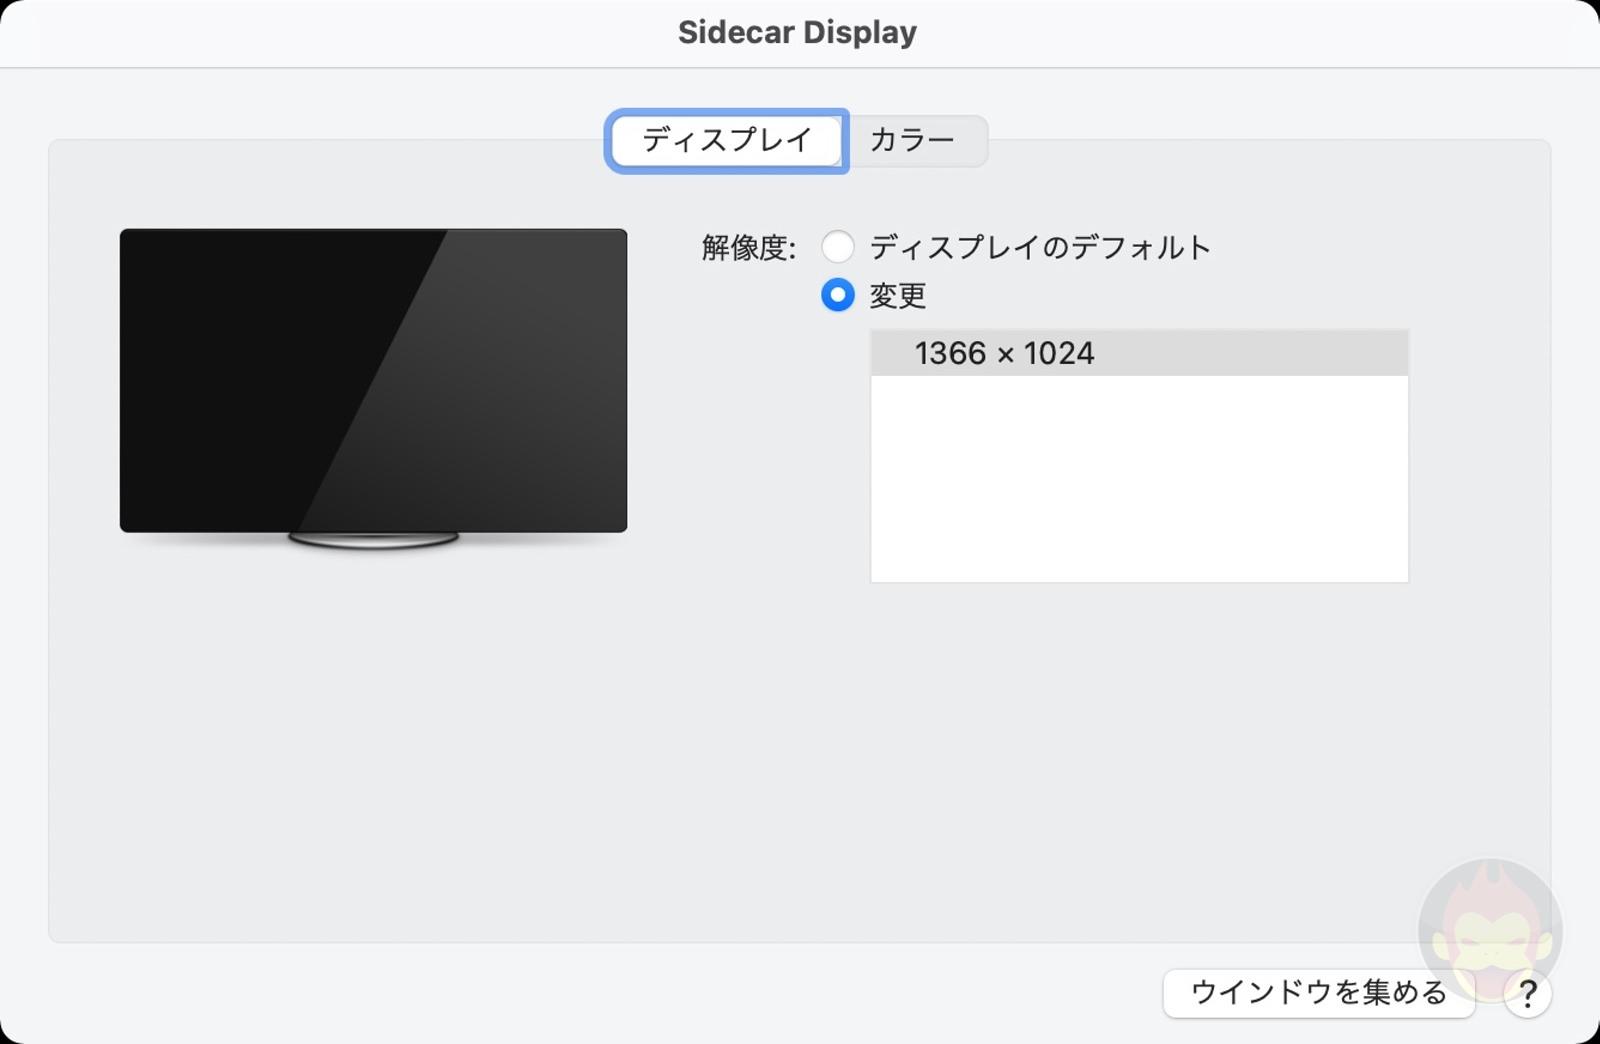 Sidecar-Display-Resolution-01.jpg